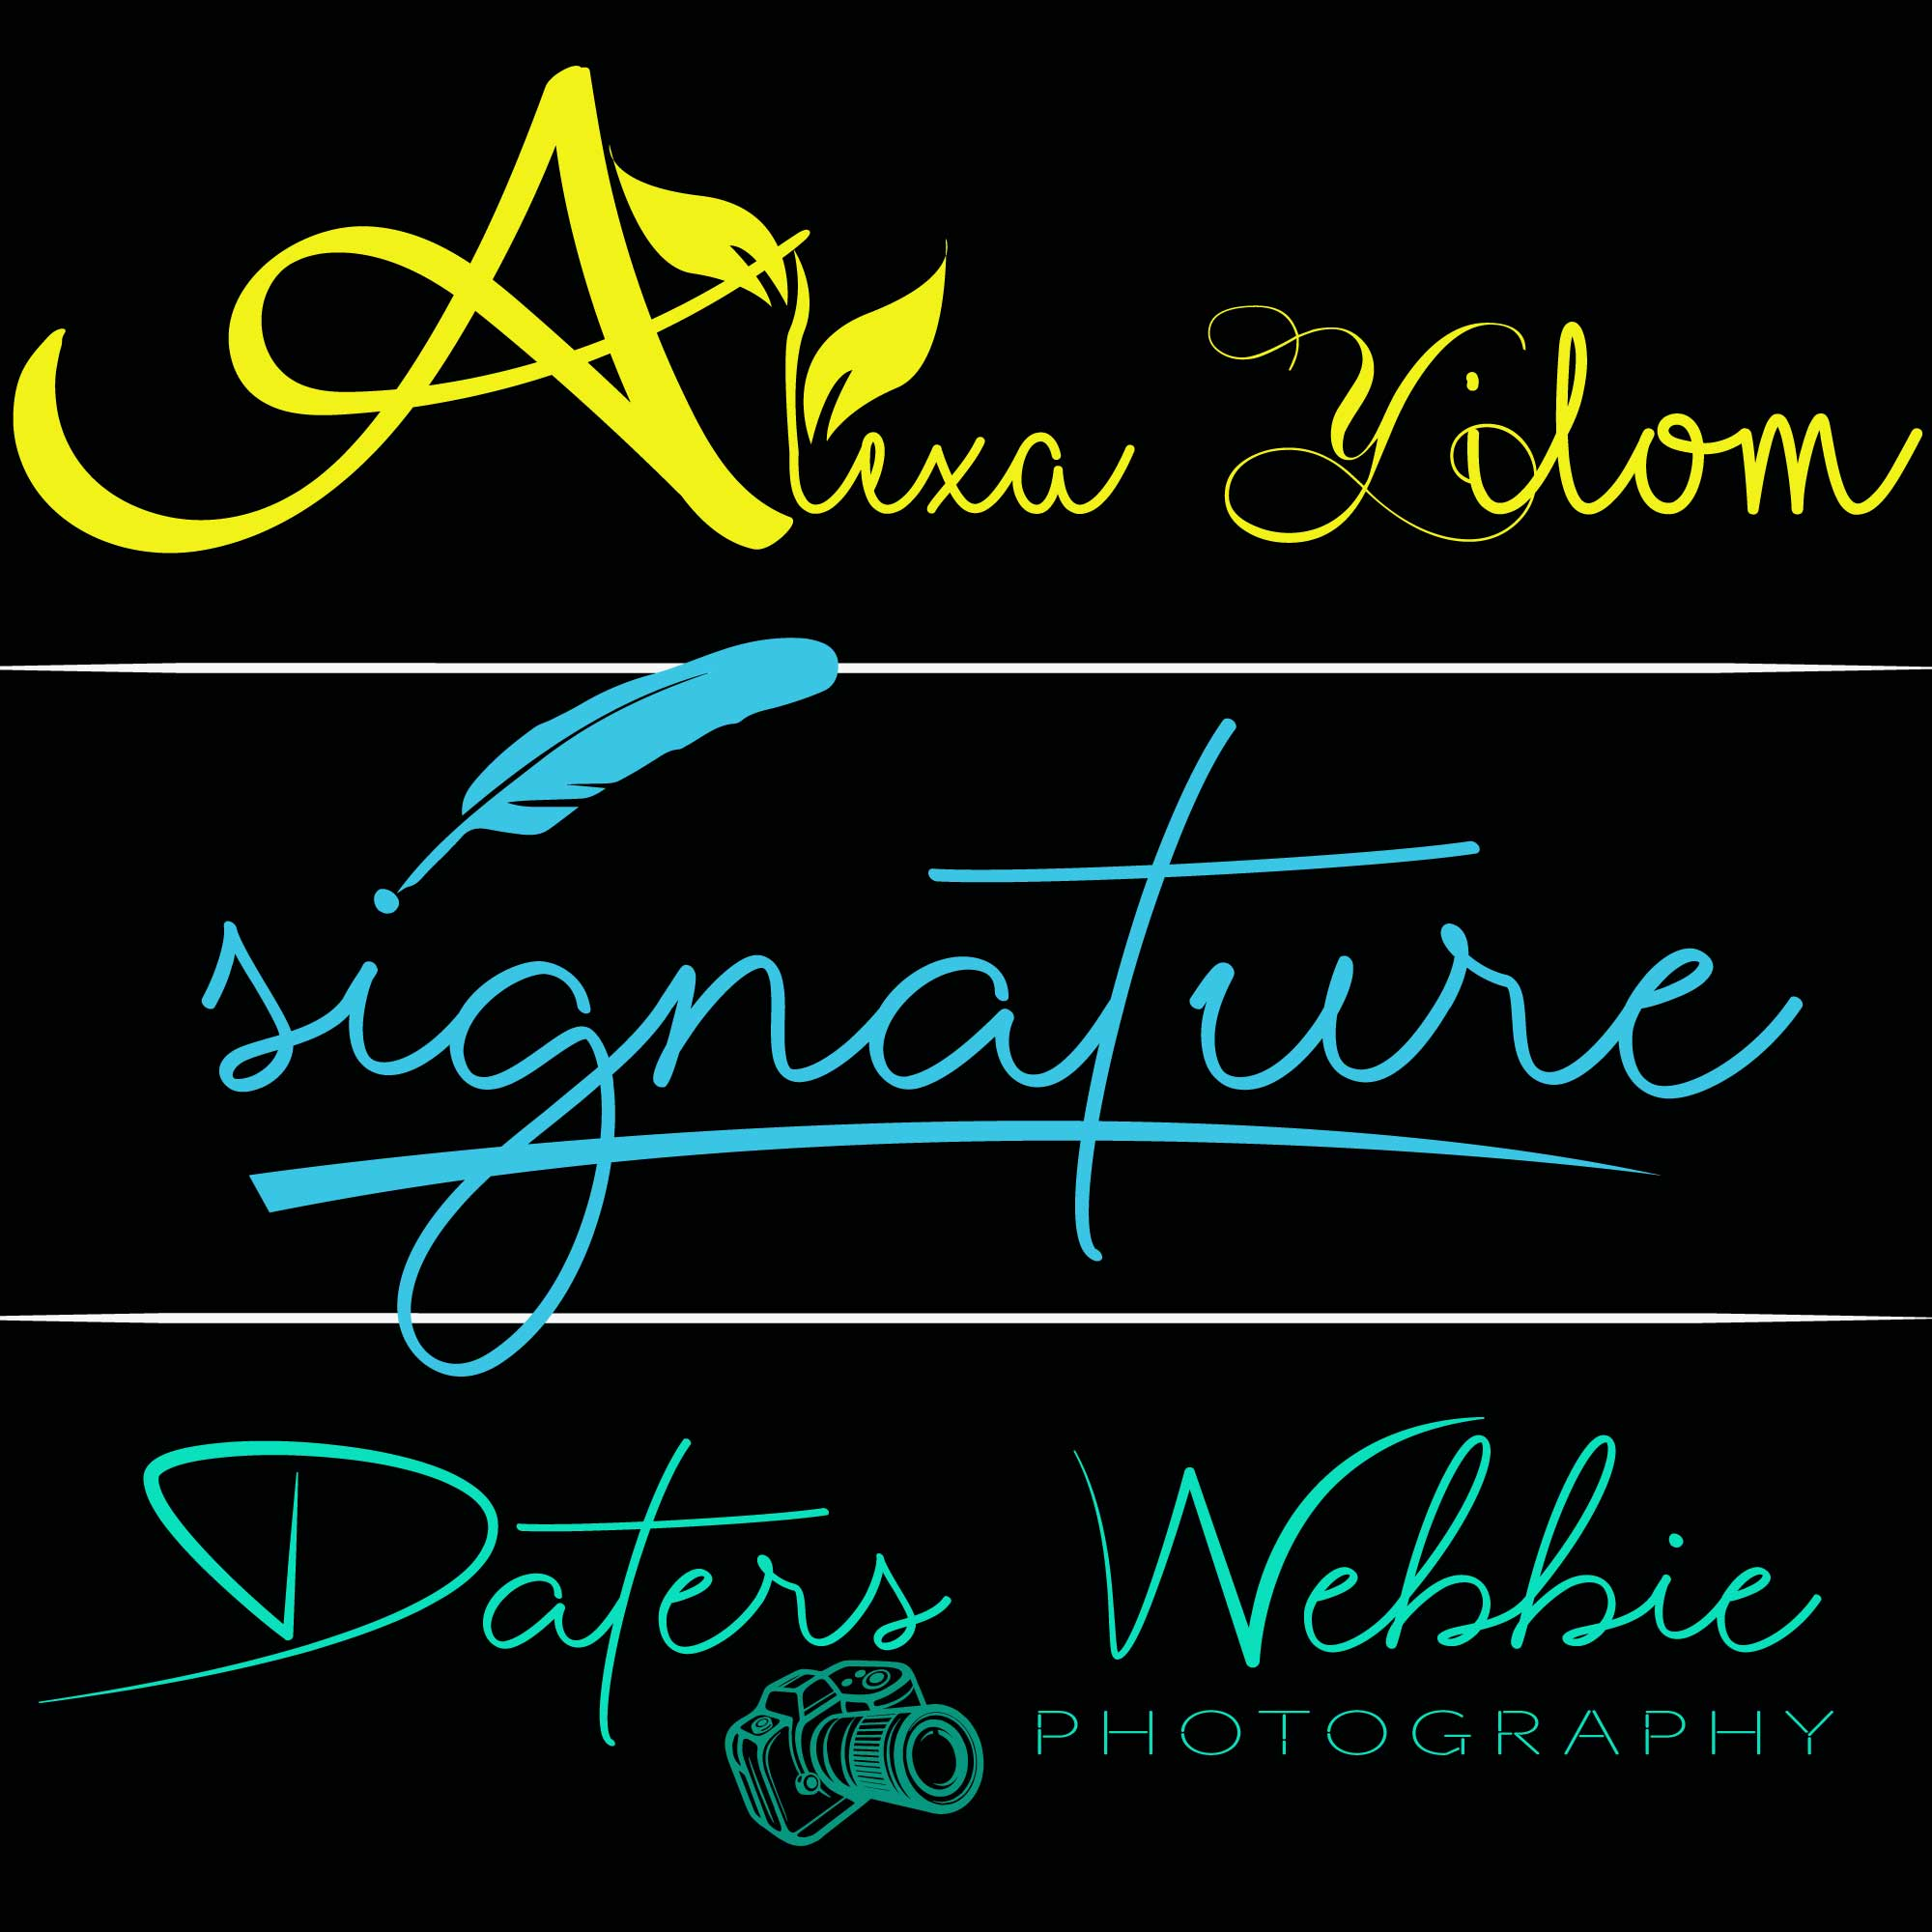 I will do standard and unique signature logo design for you